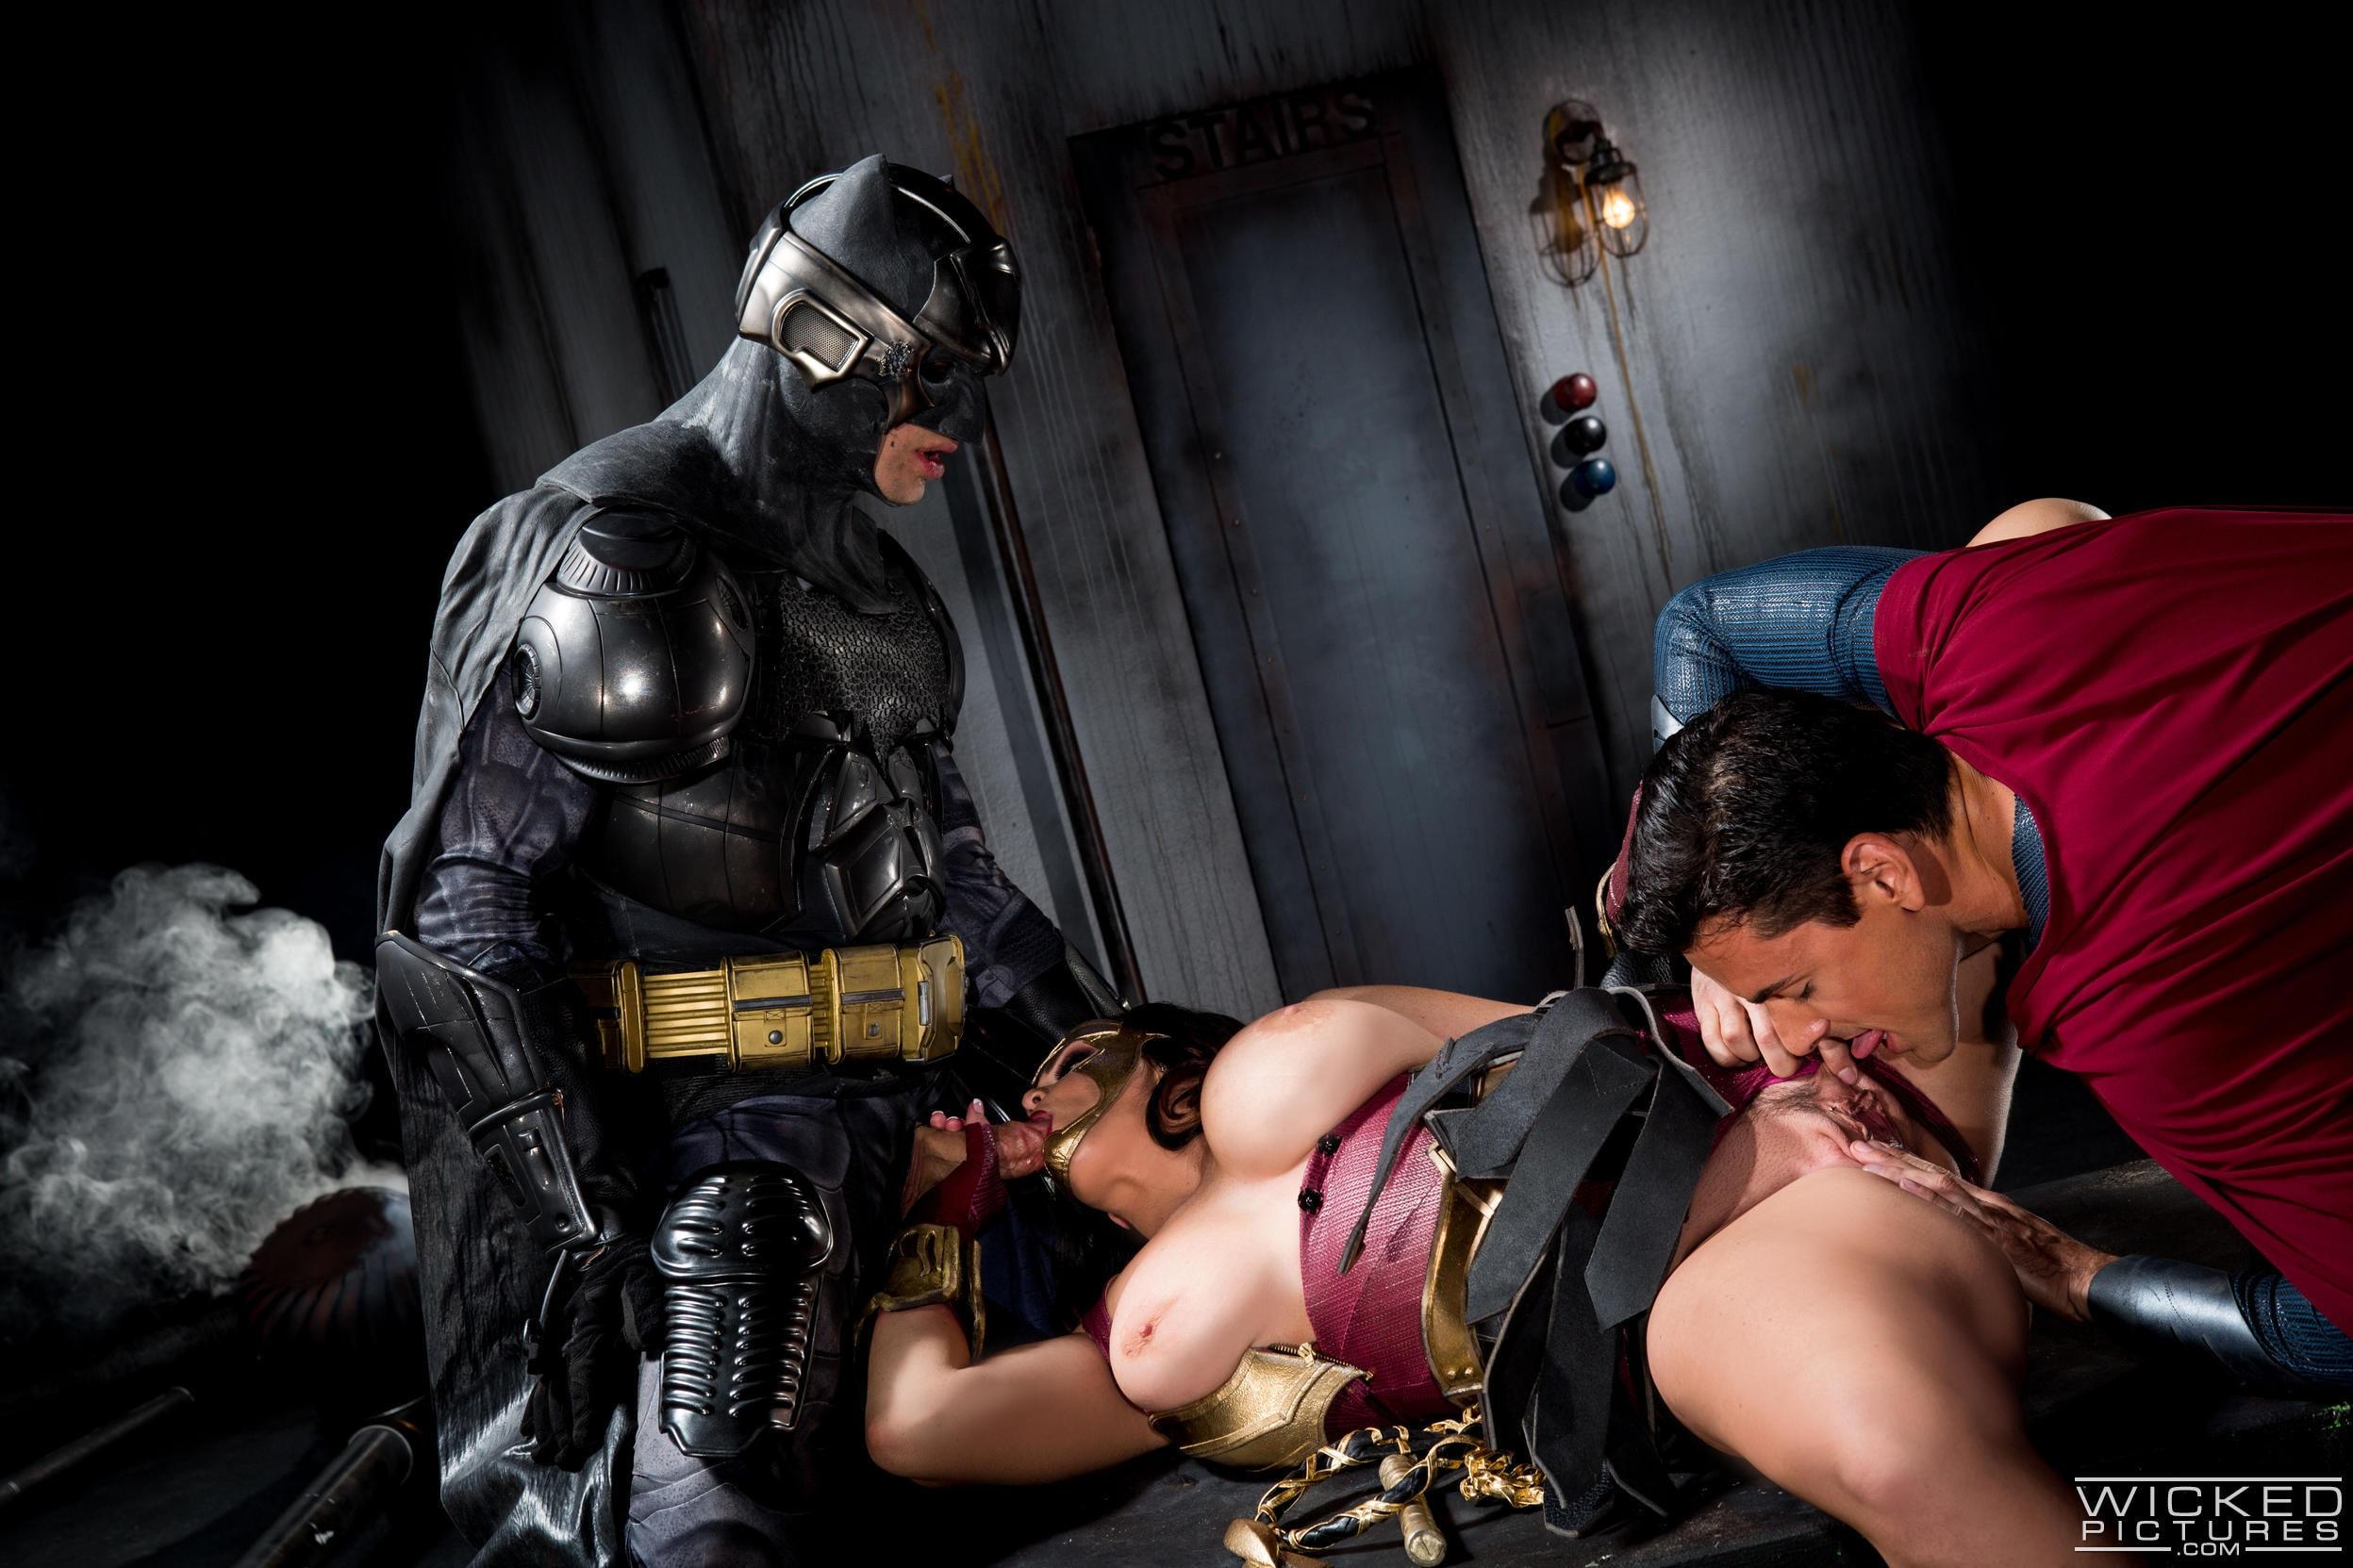 Batman Porn Parody Full Rattsleepsubg